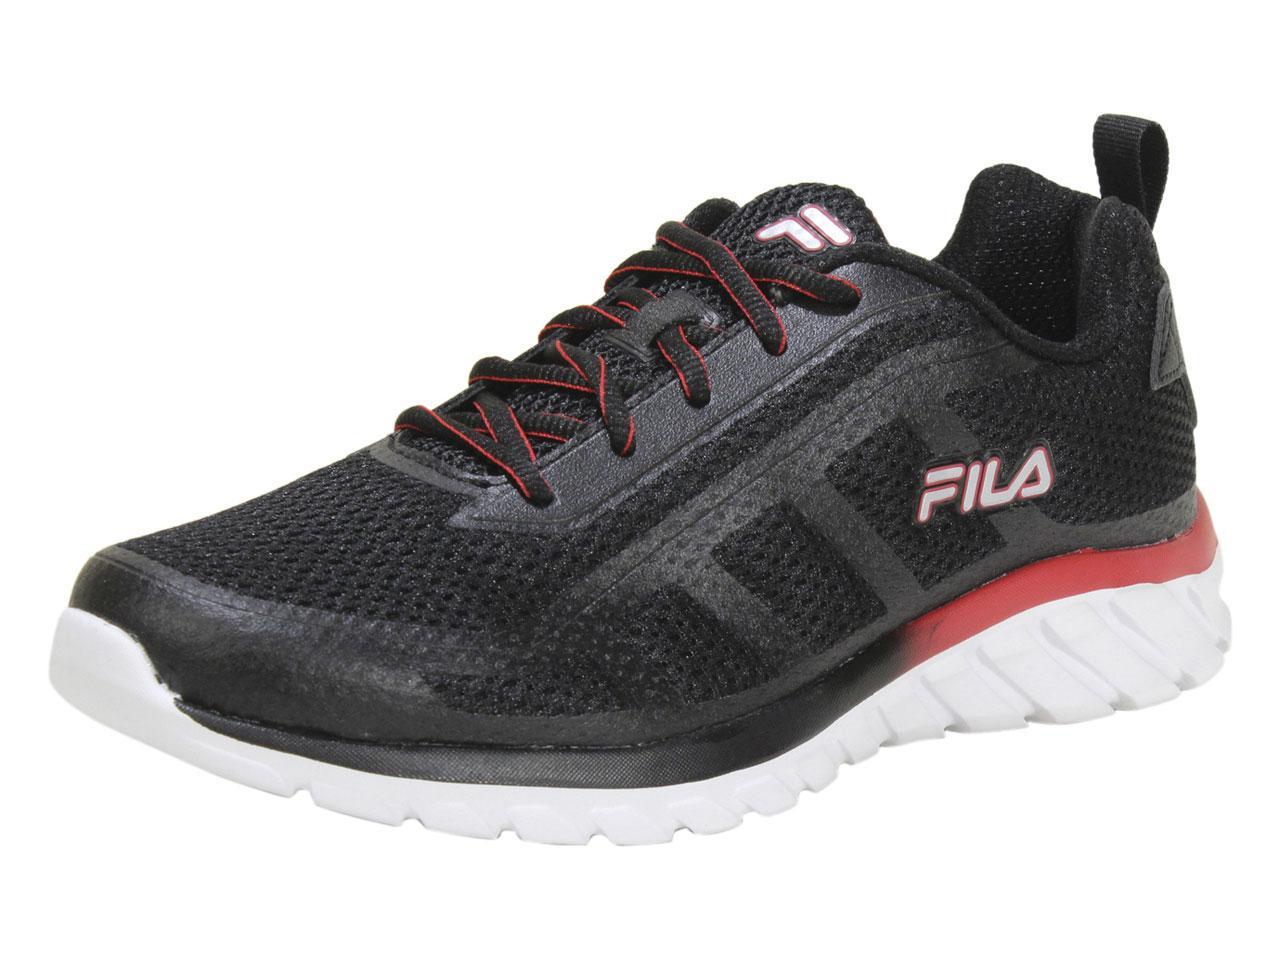 Fila Men's Memory Diskize 2 Memory Foam Running Sneakers Shoes